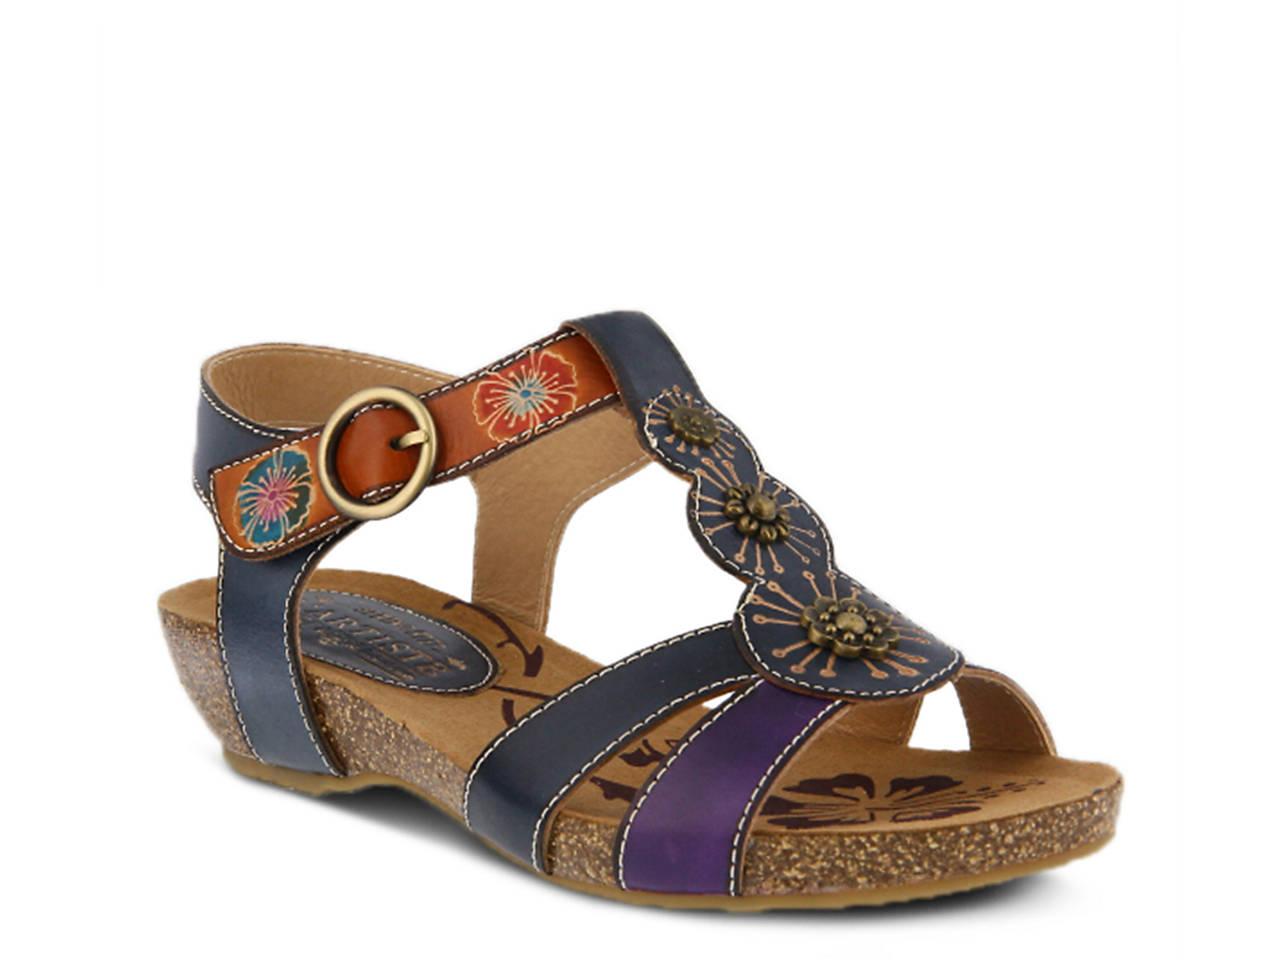 8c3484db740 L Artiste by Spring Step Hemlock Wedge Sandal Women s Shoes